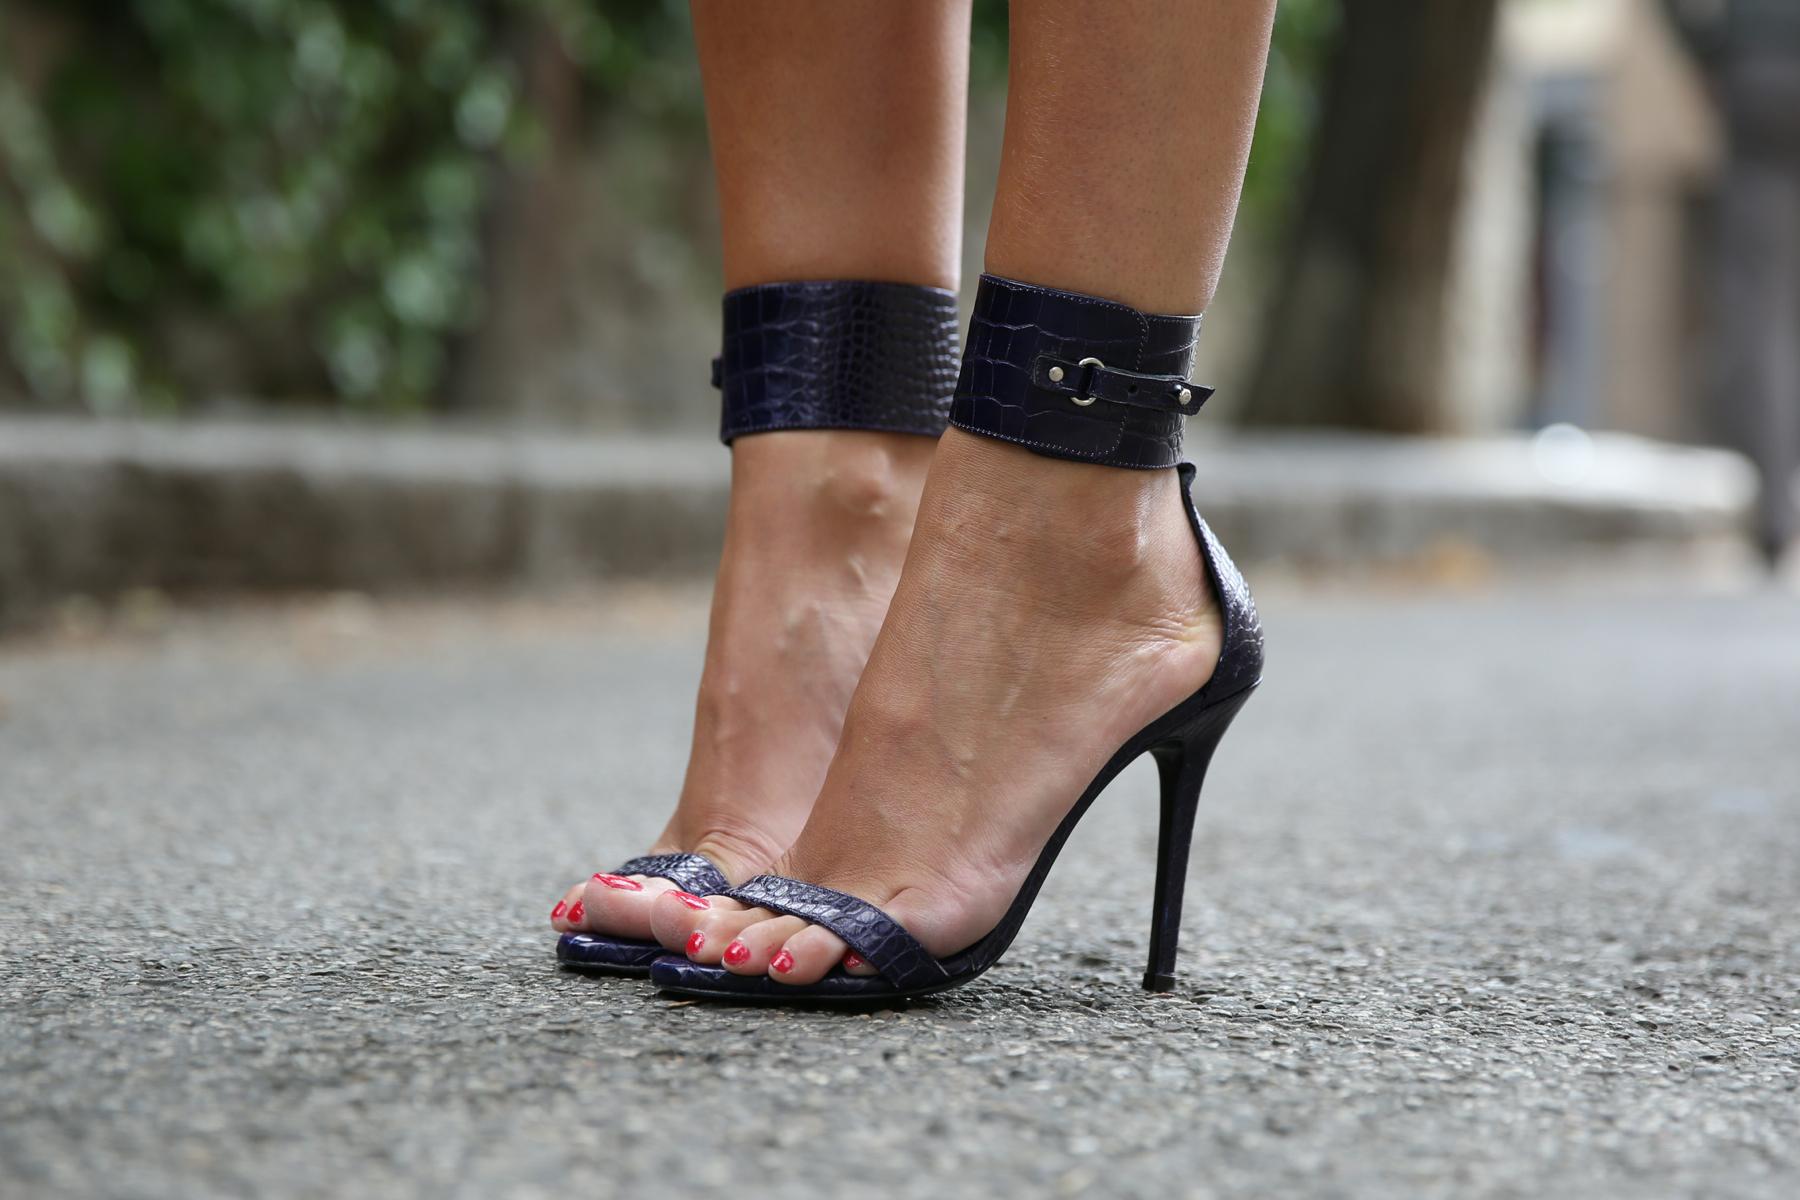 trendy_taste-look-outfit-street_style-ootd-blogger-blog-fashion_spain-moda_españa-yellow_dress-vestido_amarillo-boda-wedding-evento-clutch_pedreria-mas34-sandalias_azules-blue_sandals-5